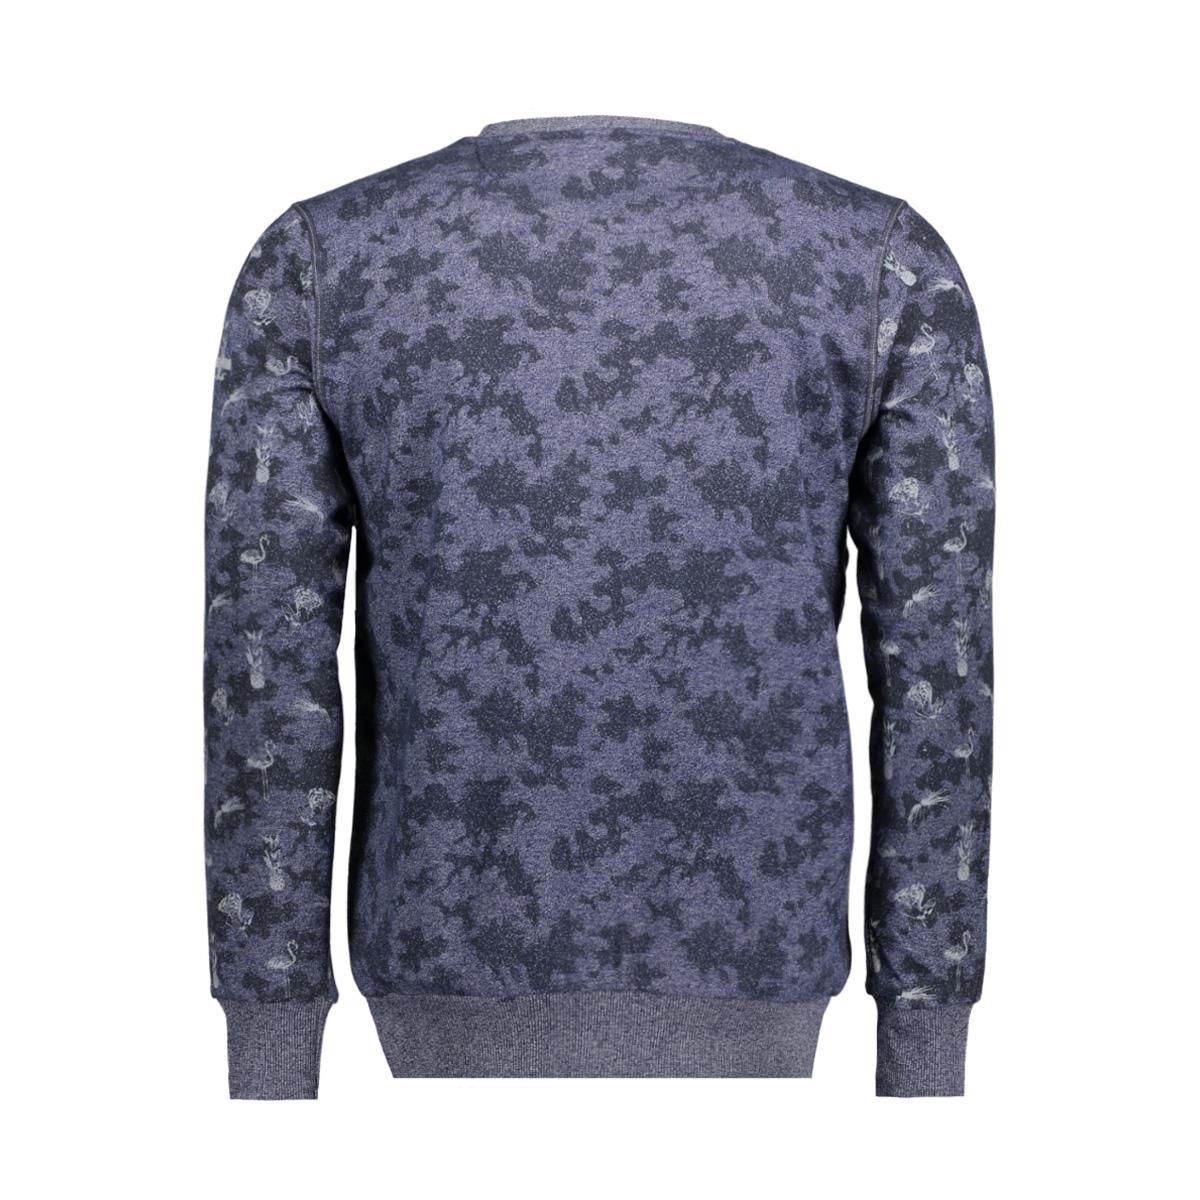 76135 gabbiano sweater navy